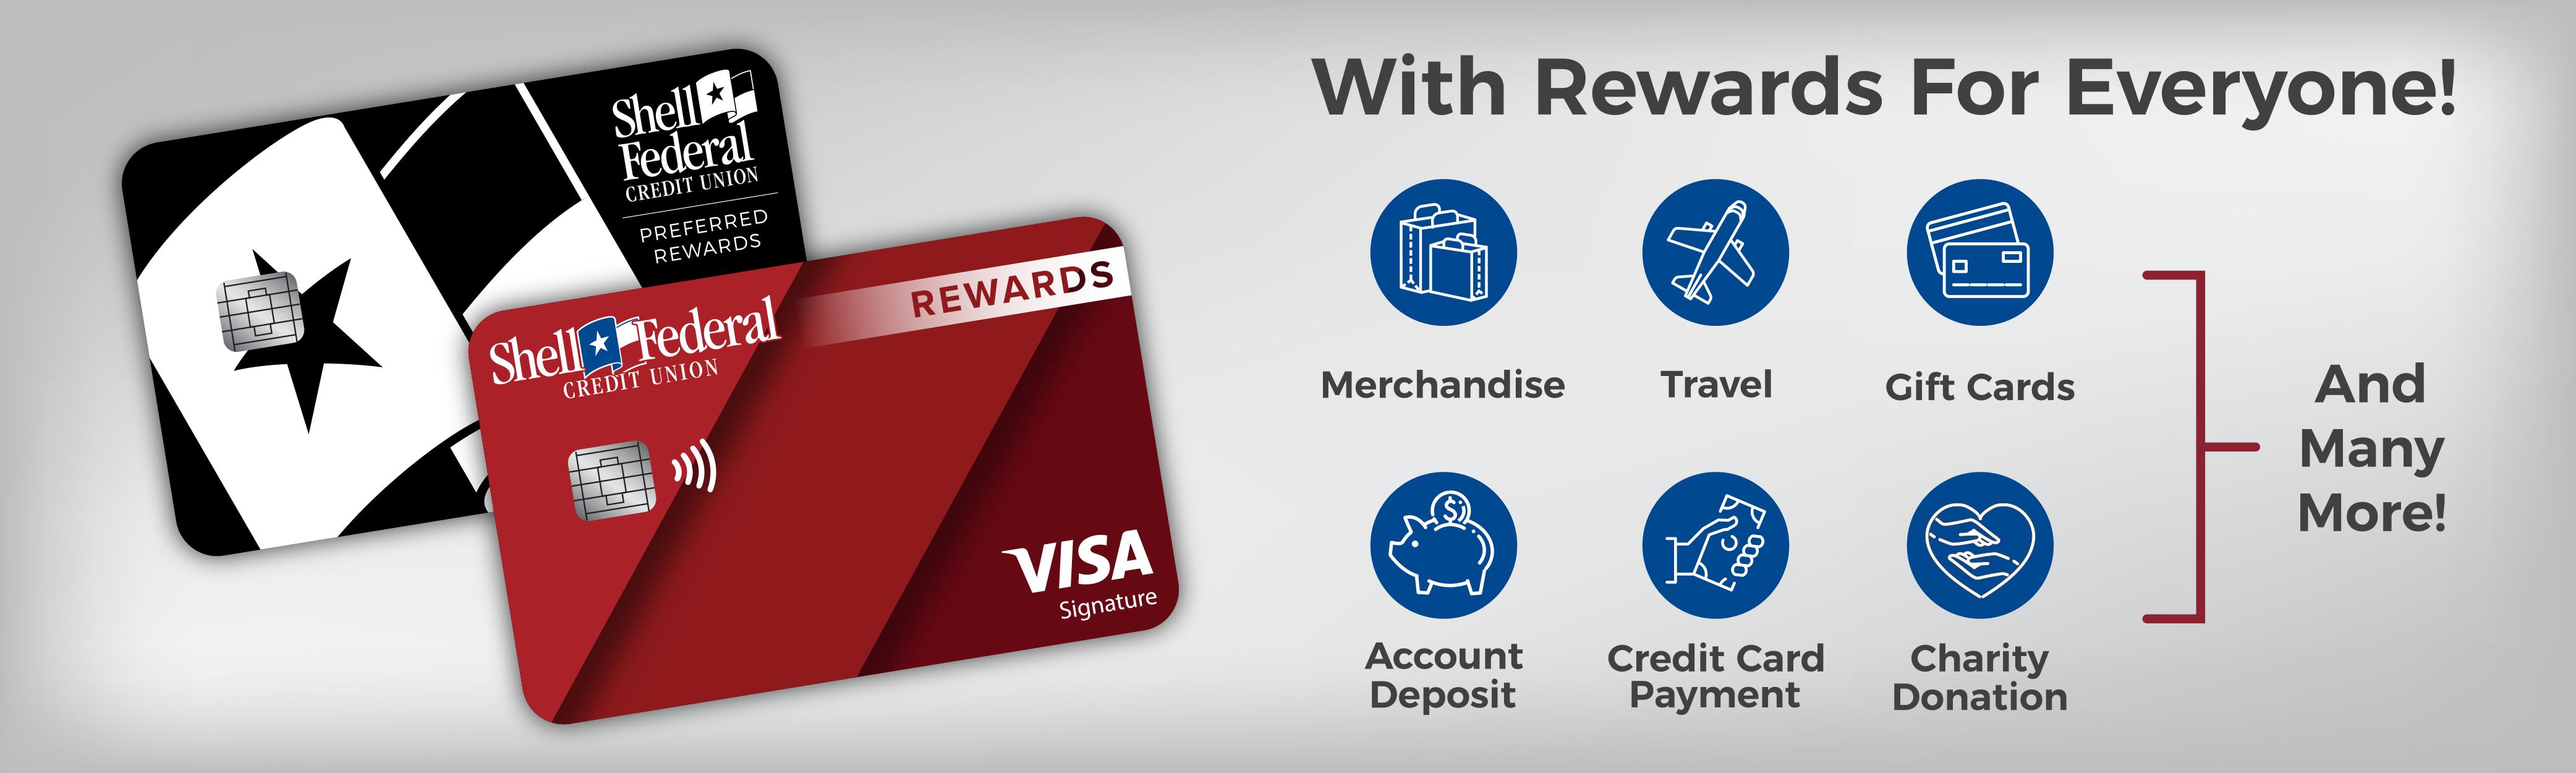 CreditCards-Rewards-For-Everyone